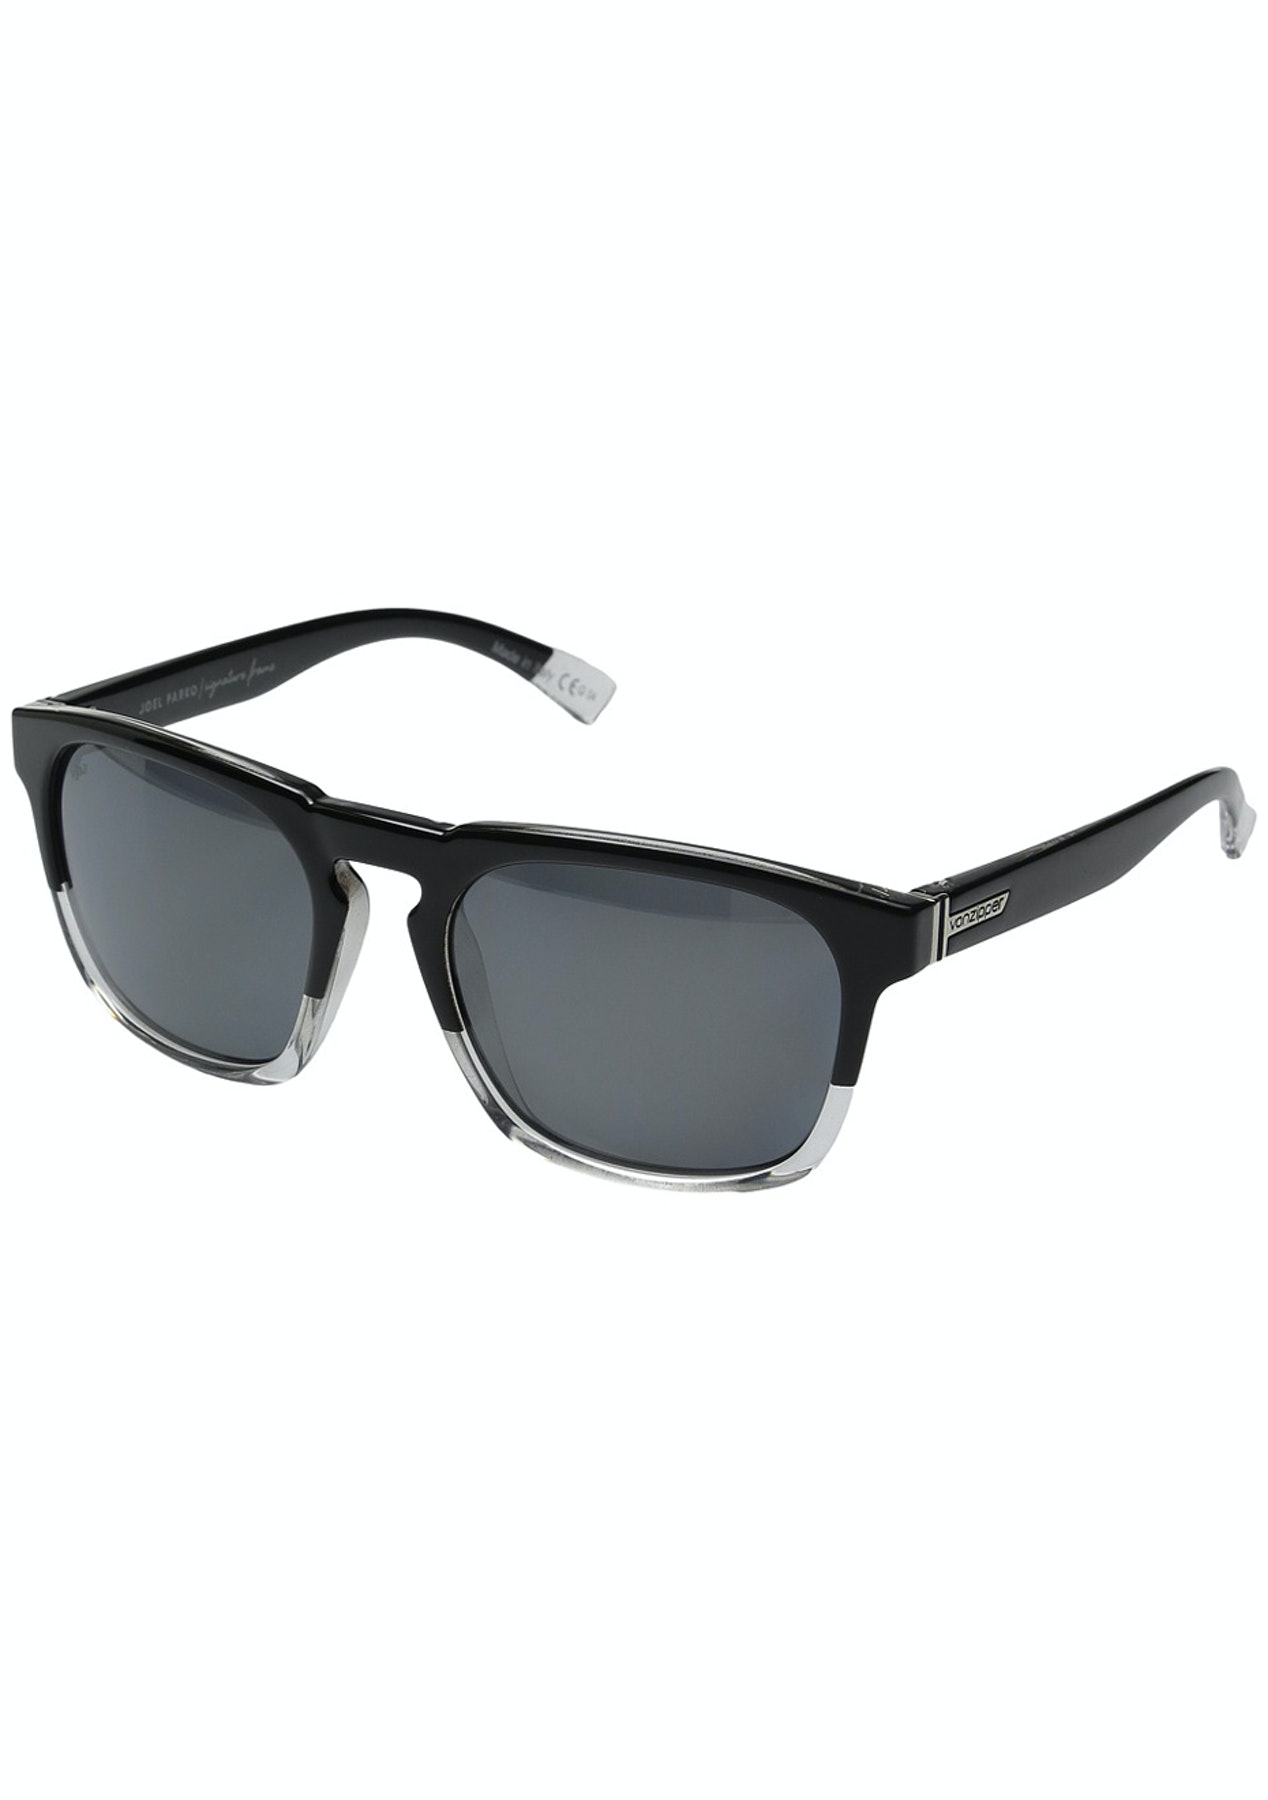 4b4bae85b70 Von Zipper - Banner JP Black Crystal Polarised - The Big Sunglasses Sale -  Onceit